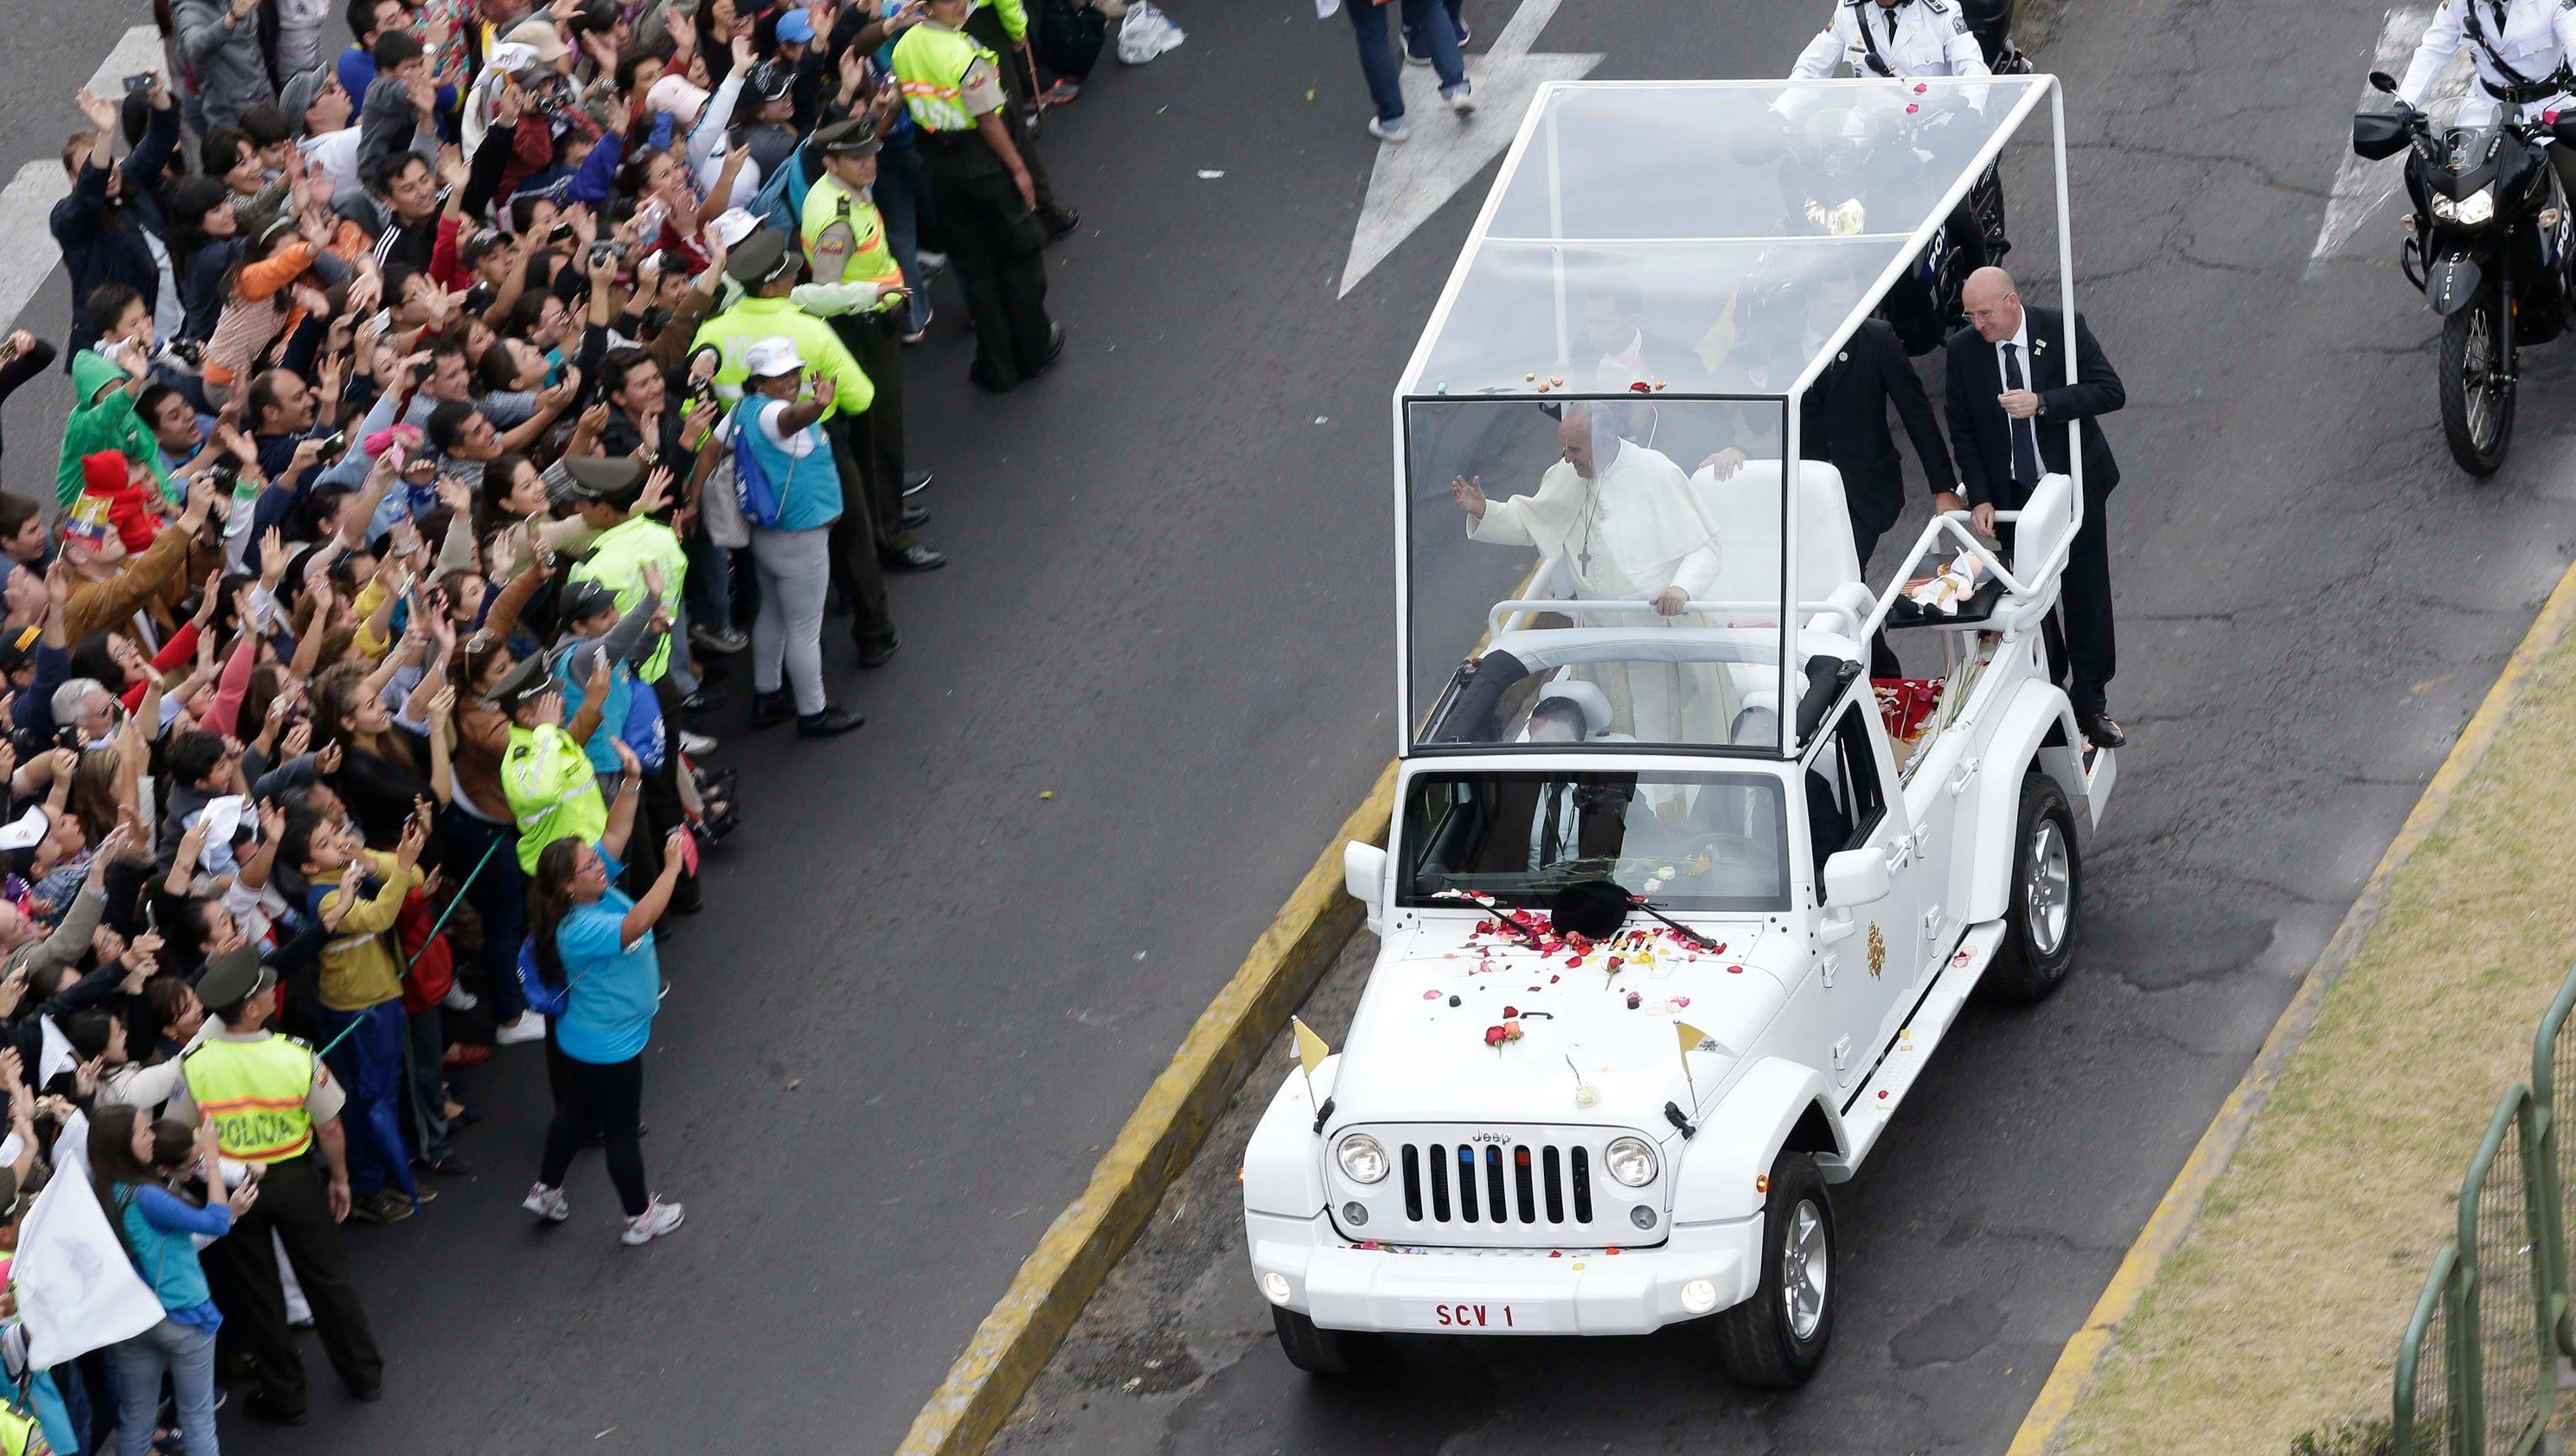 Best Jeep Wrangler >> Pope Francis' popemobile is Jeep Wrangler for U.S. visit